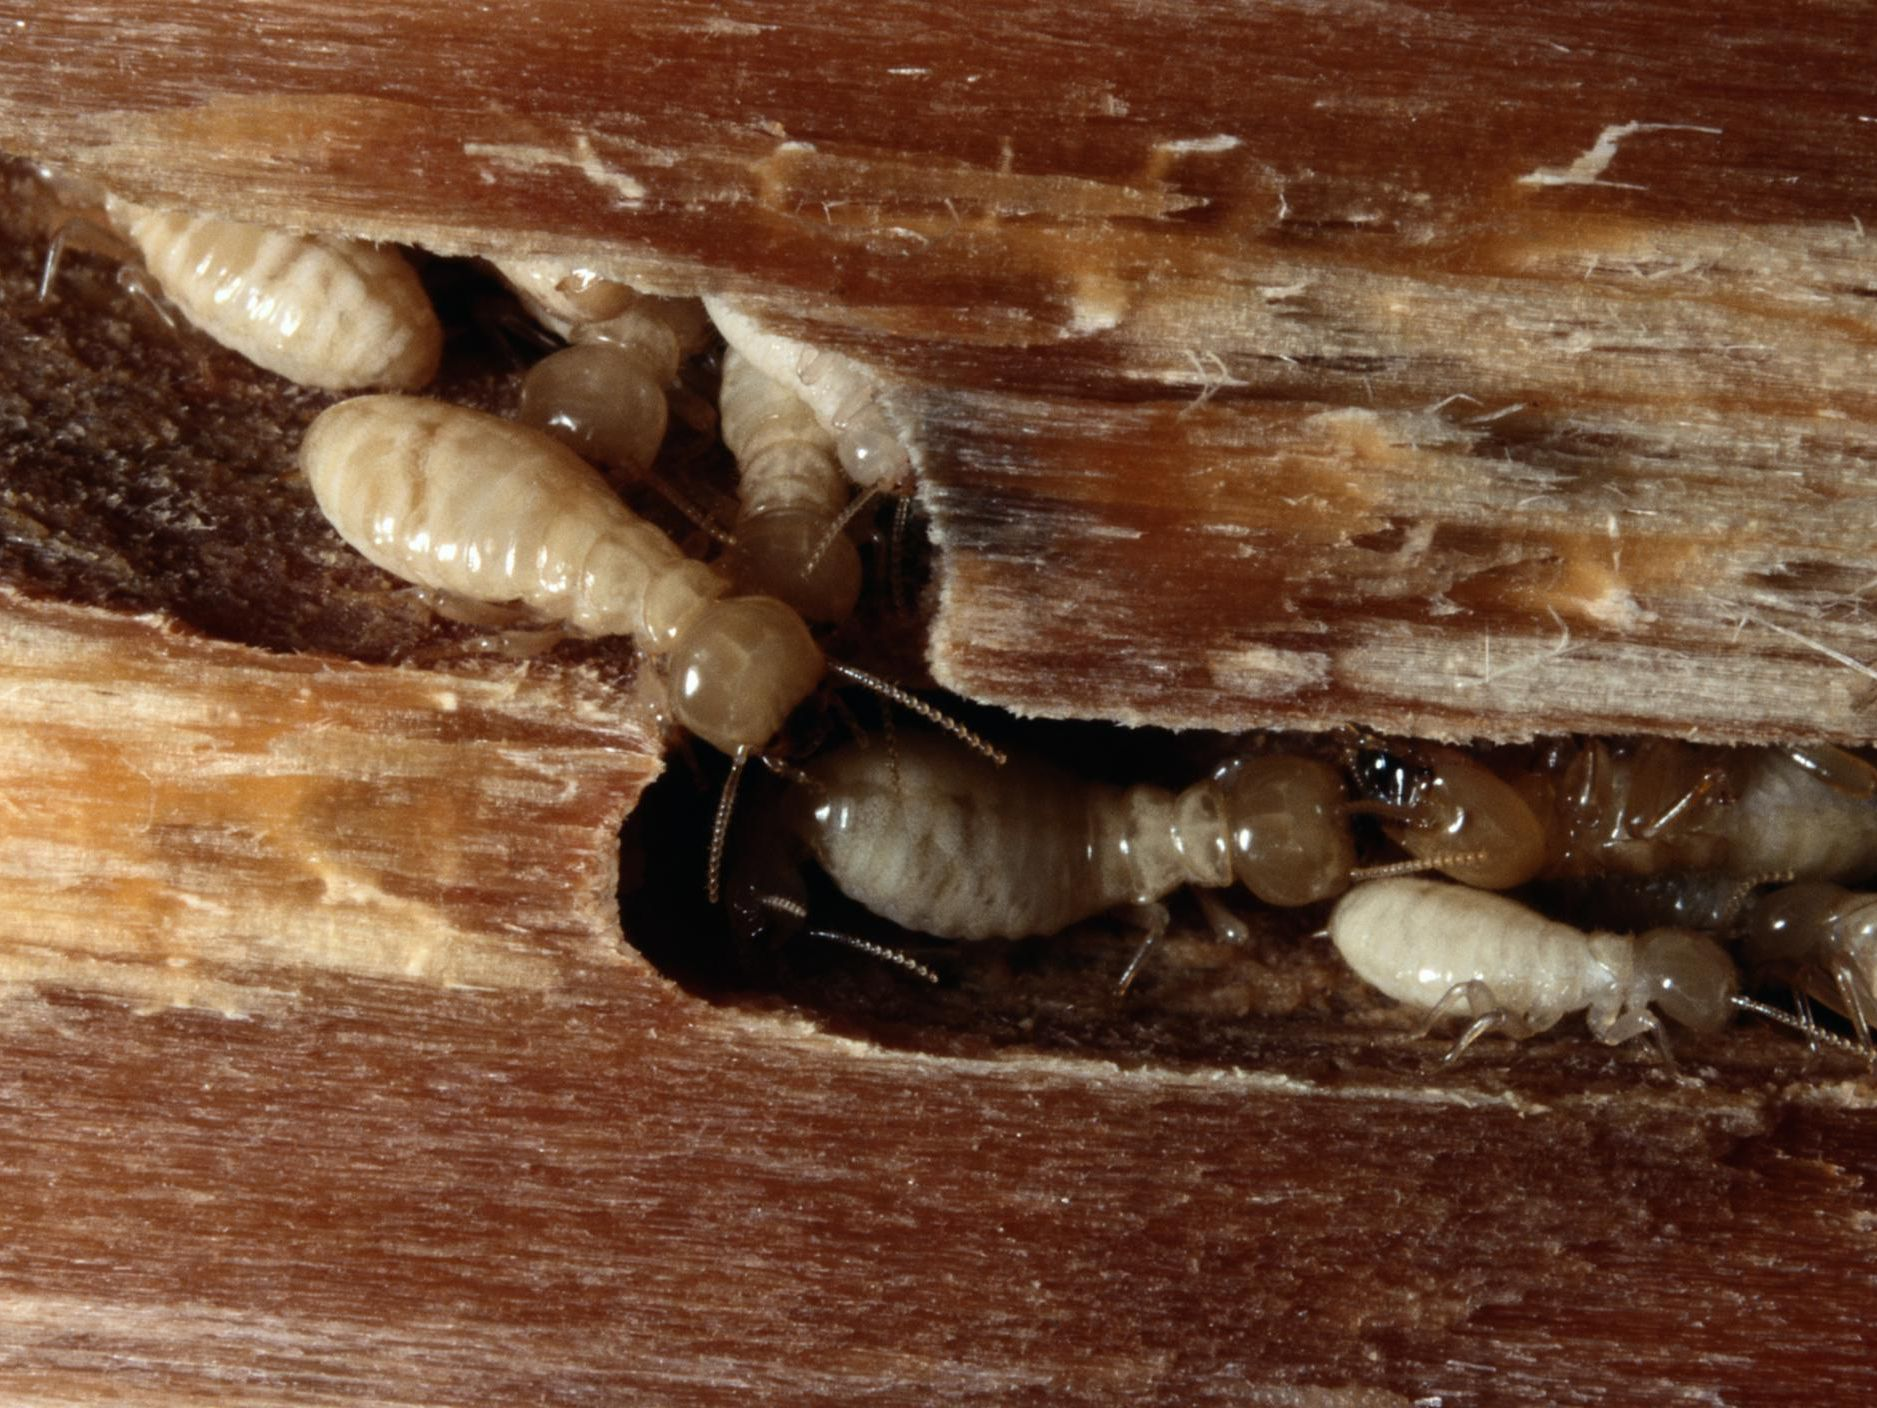 Using Orange Oil To Treat Dry Wood Termites